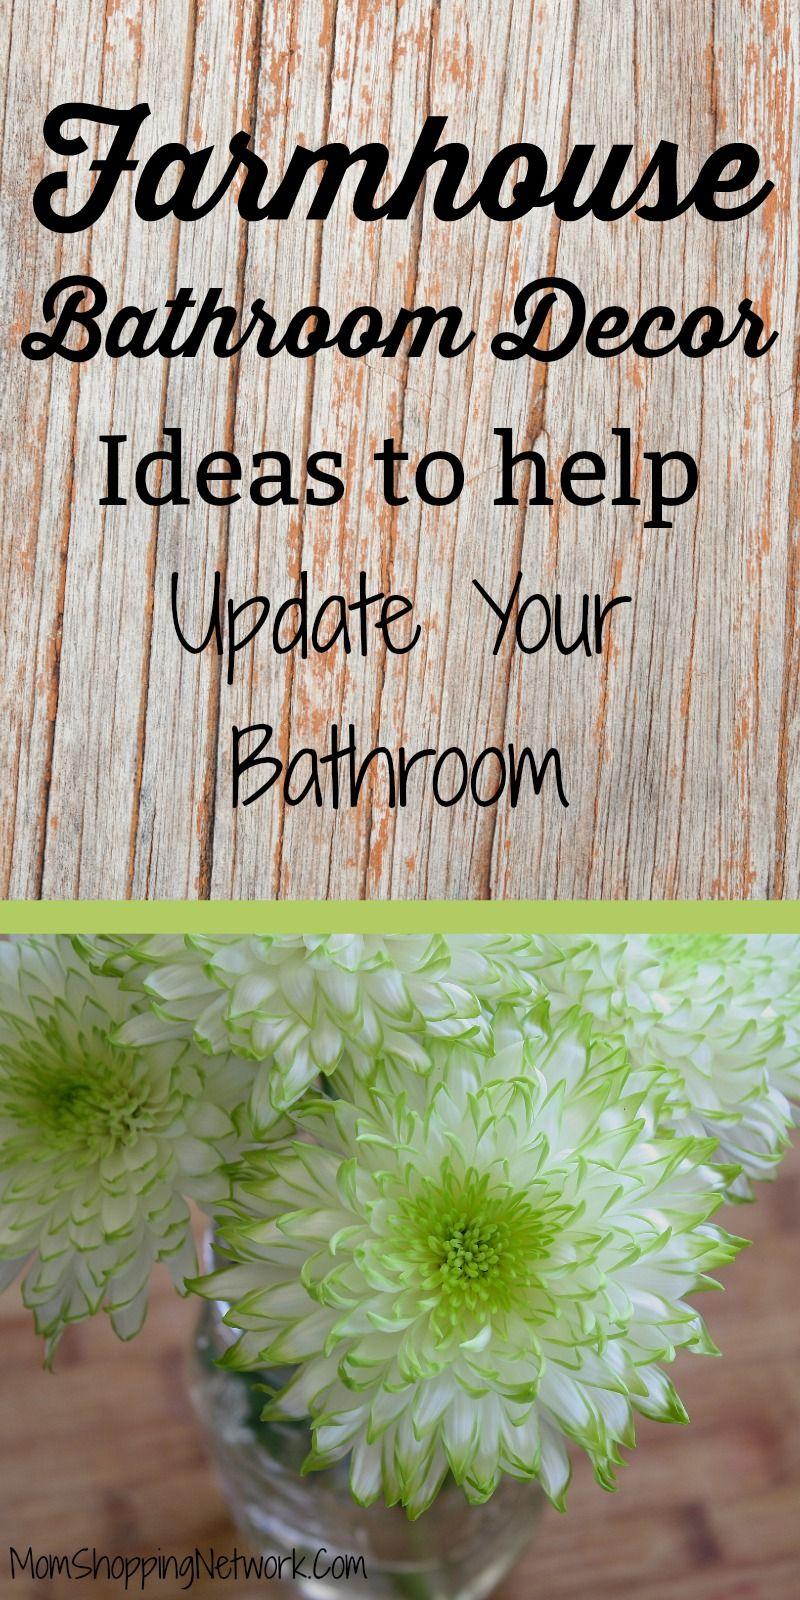 Farmhouse Bathroom Decor Ideas to Help Update Your Bathroom - The Mom Shopping Network